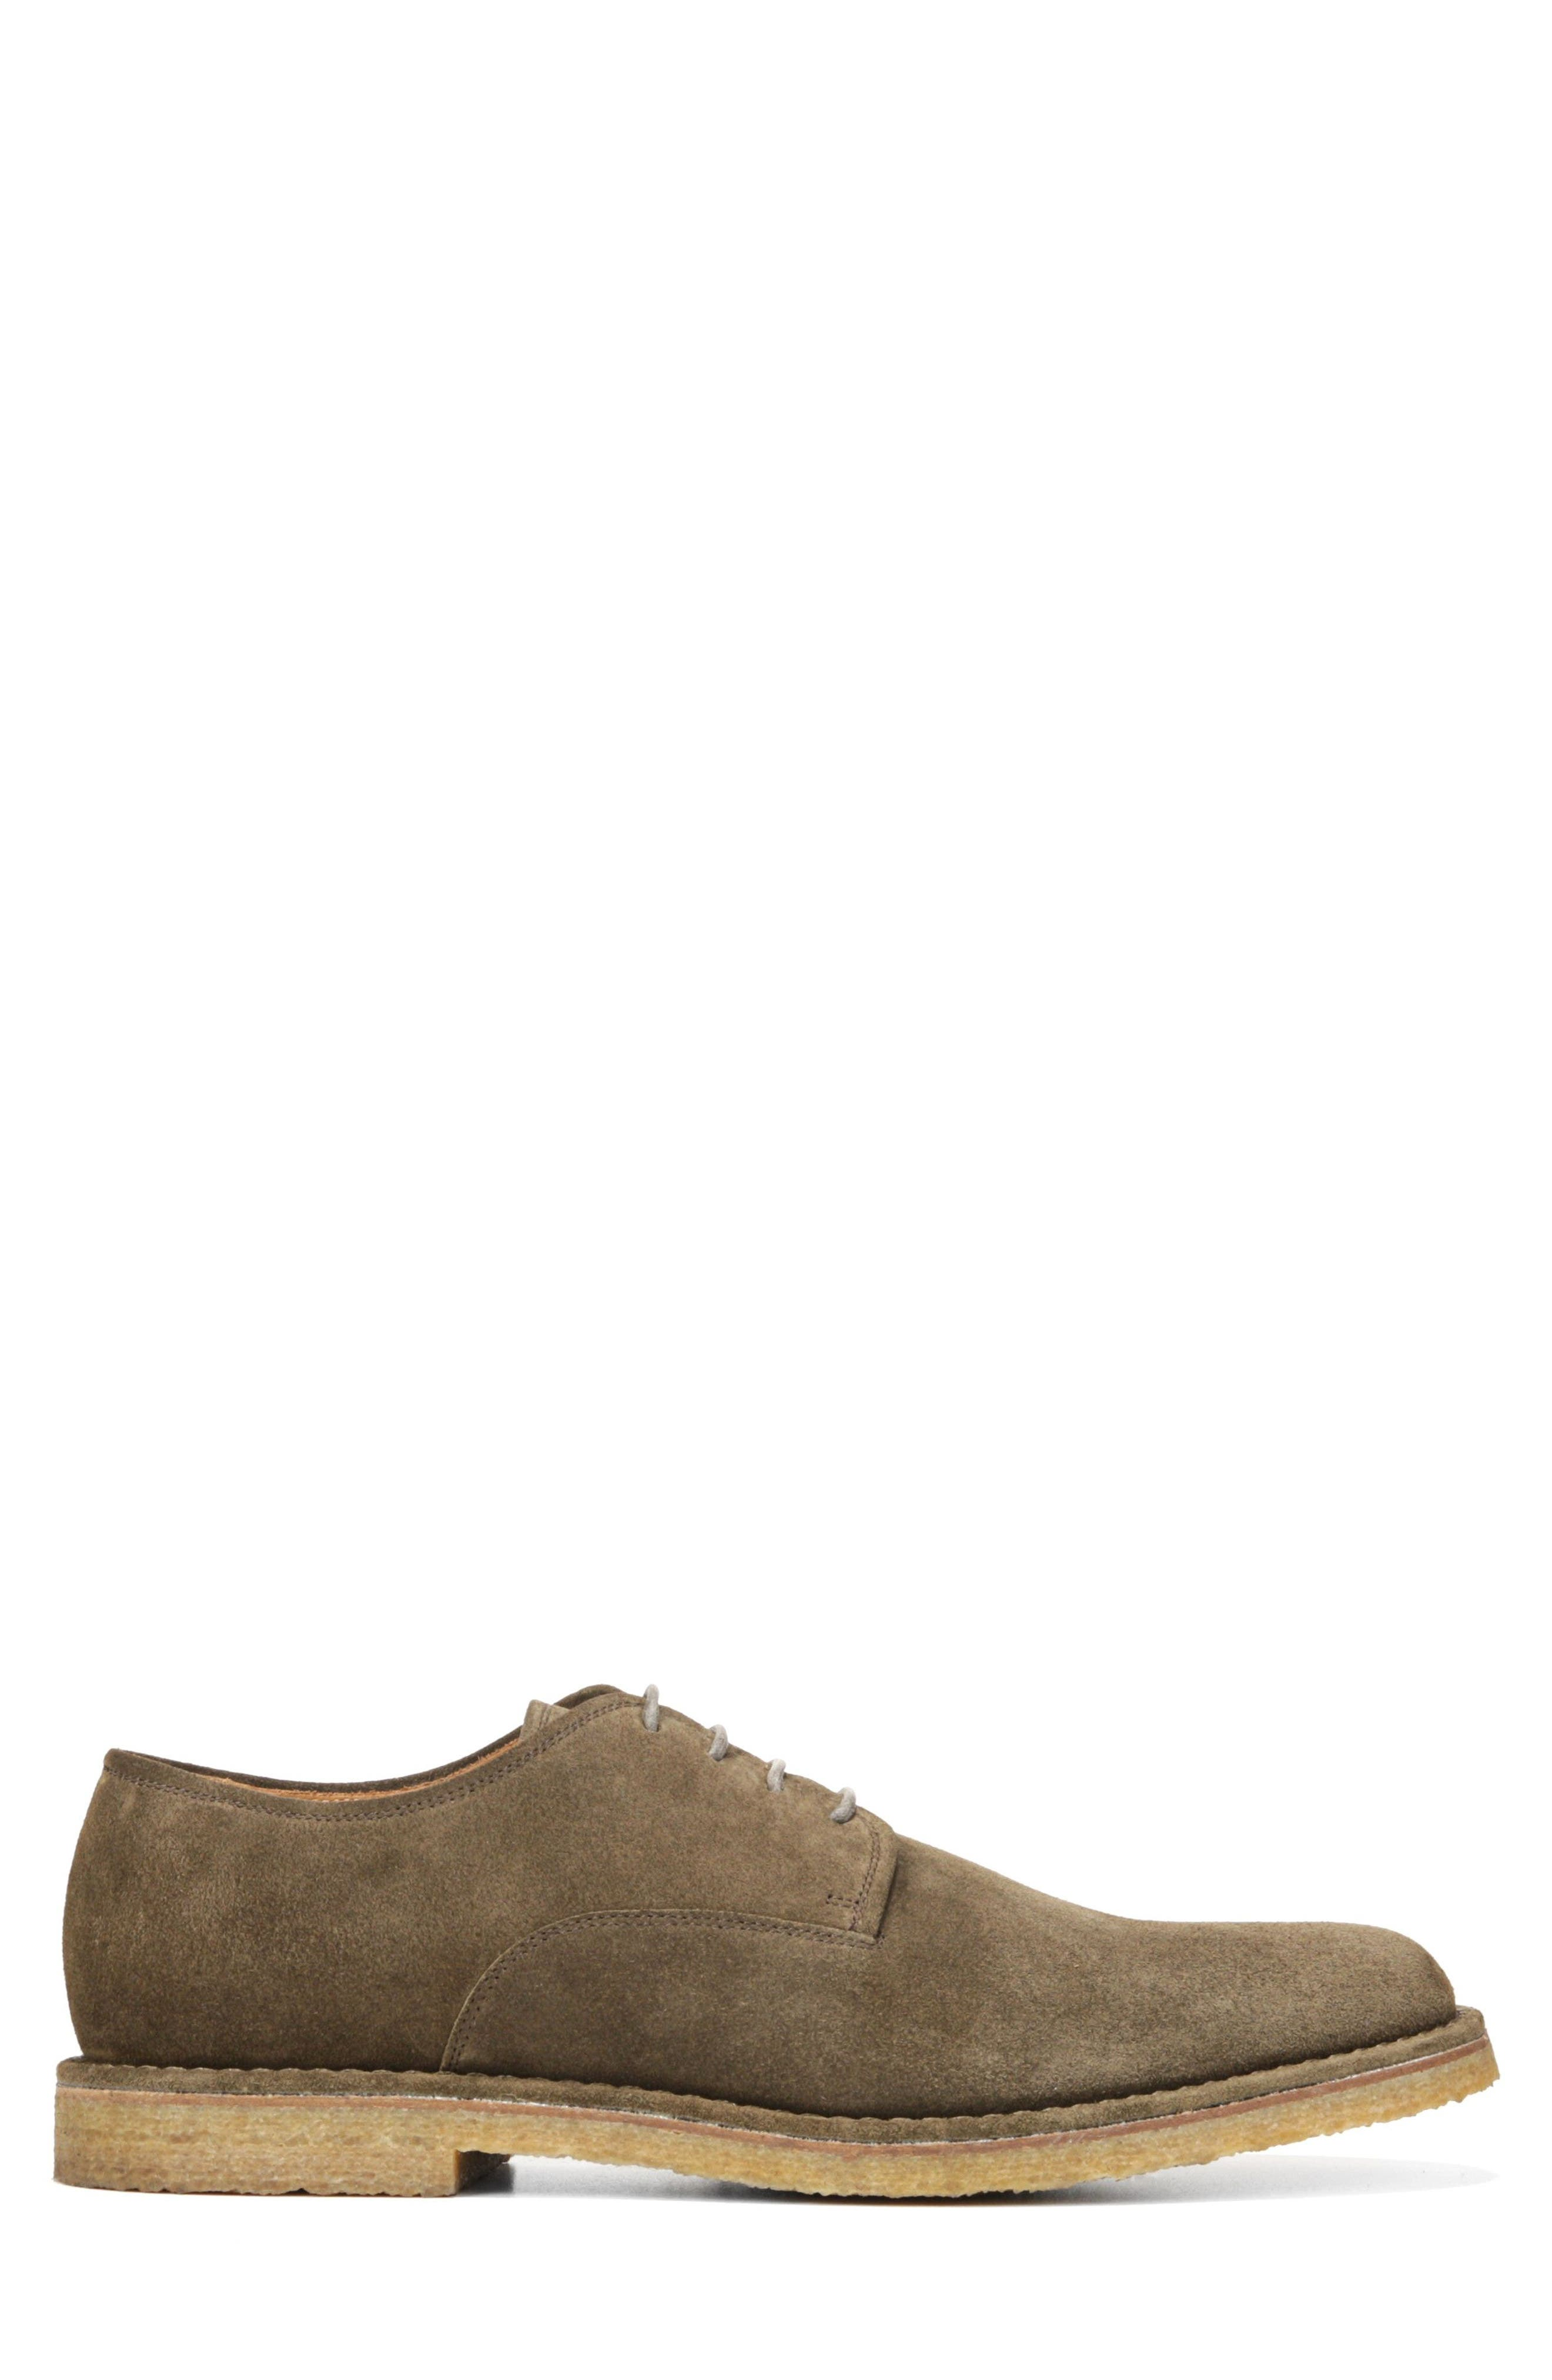 Stetson Buck Shoe,                             Alternate thumbnail 3, color,                             205